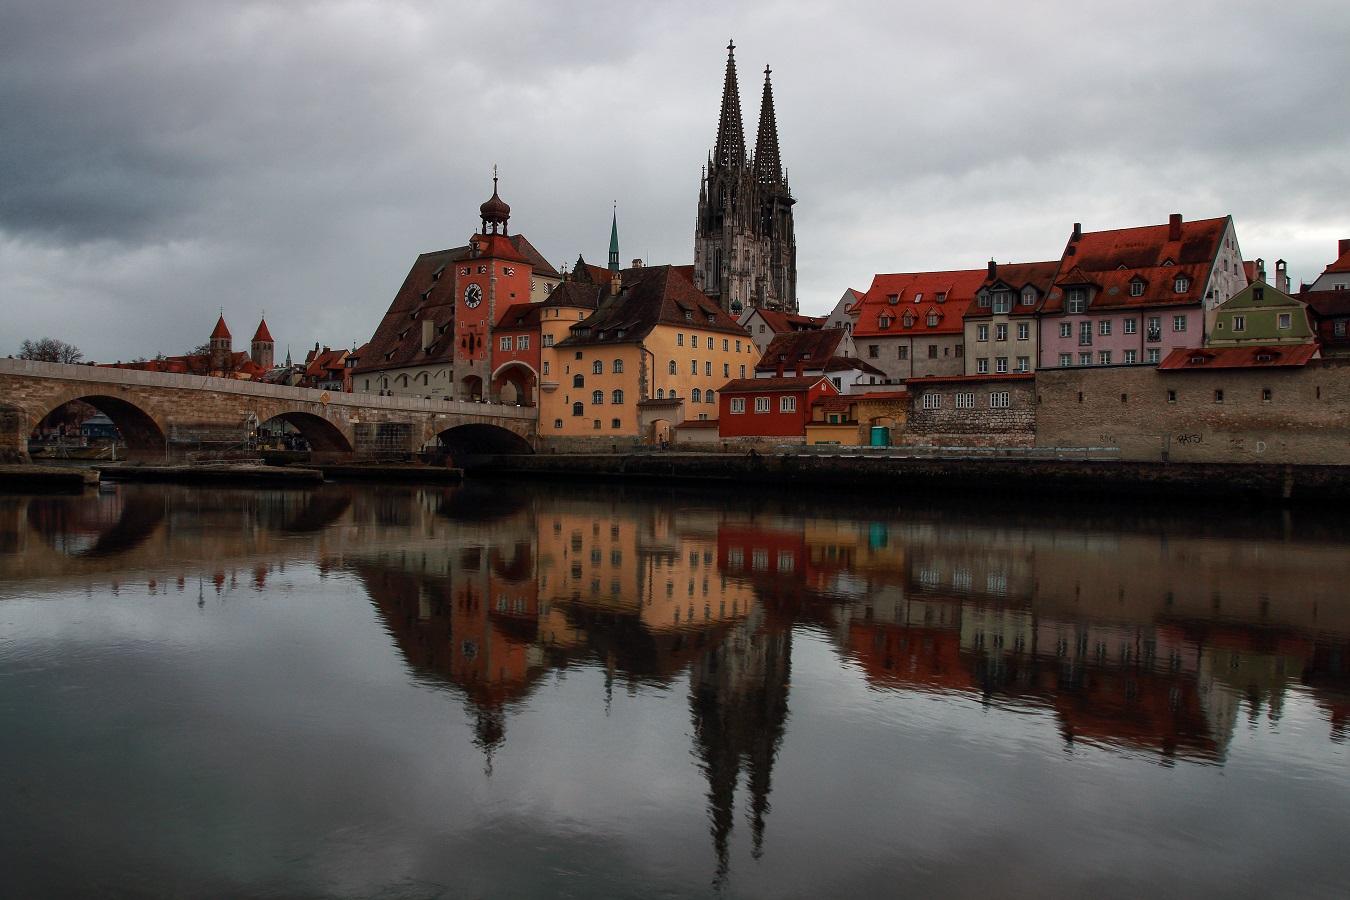 Postcard from Regensburg...